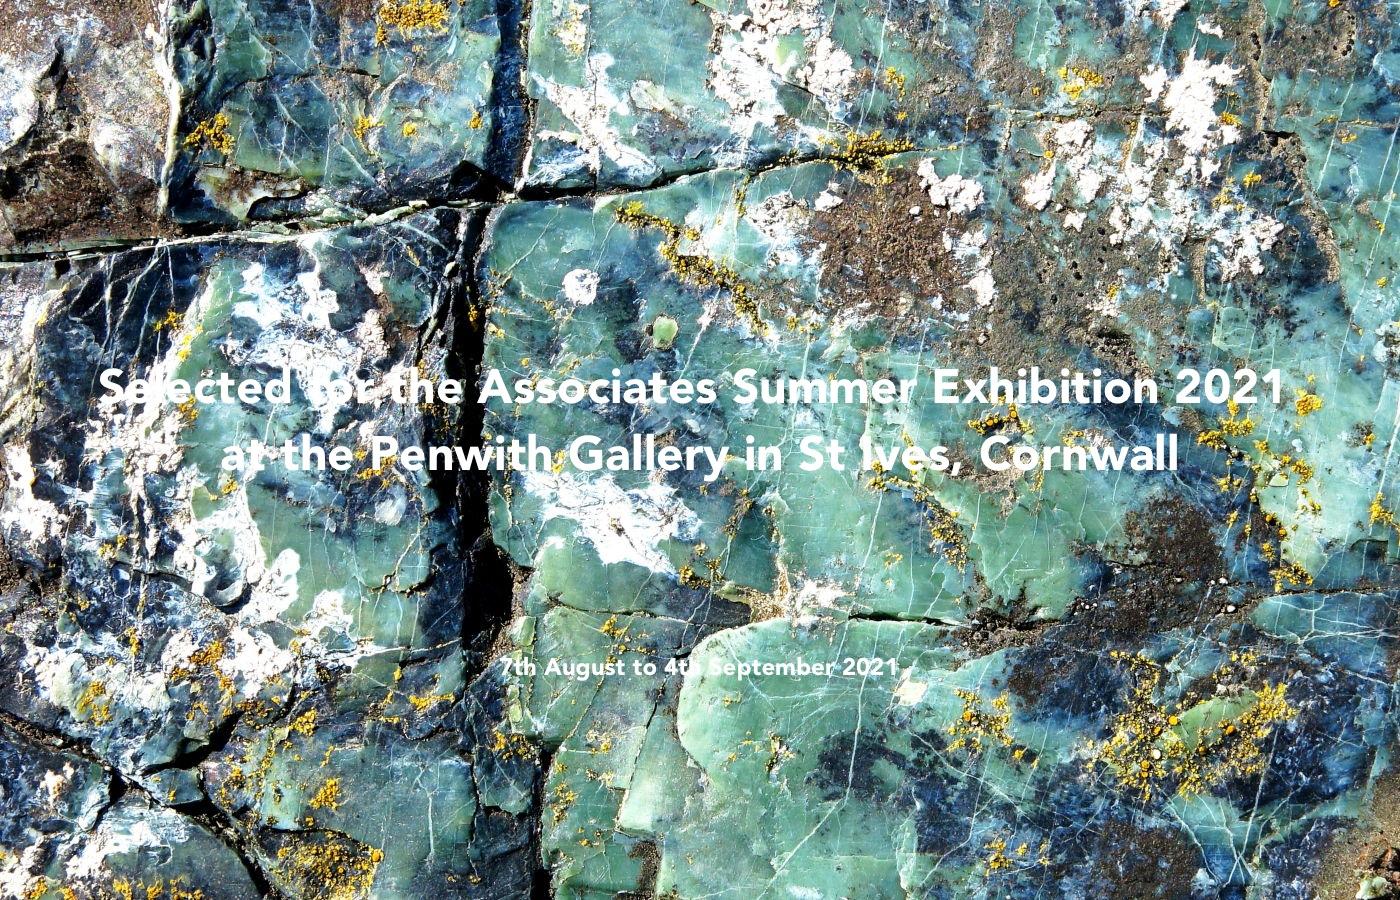 Penwith Gallery Associates Summer Exhibition 2021